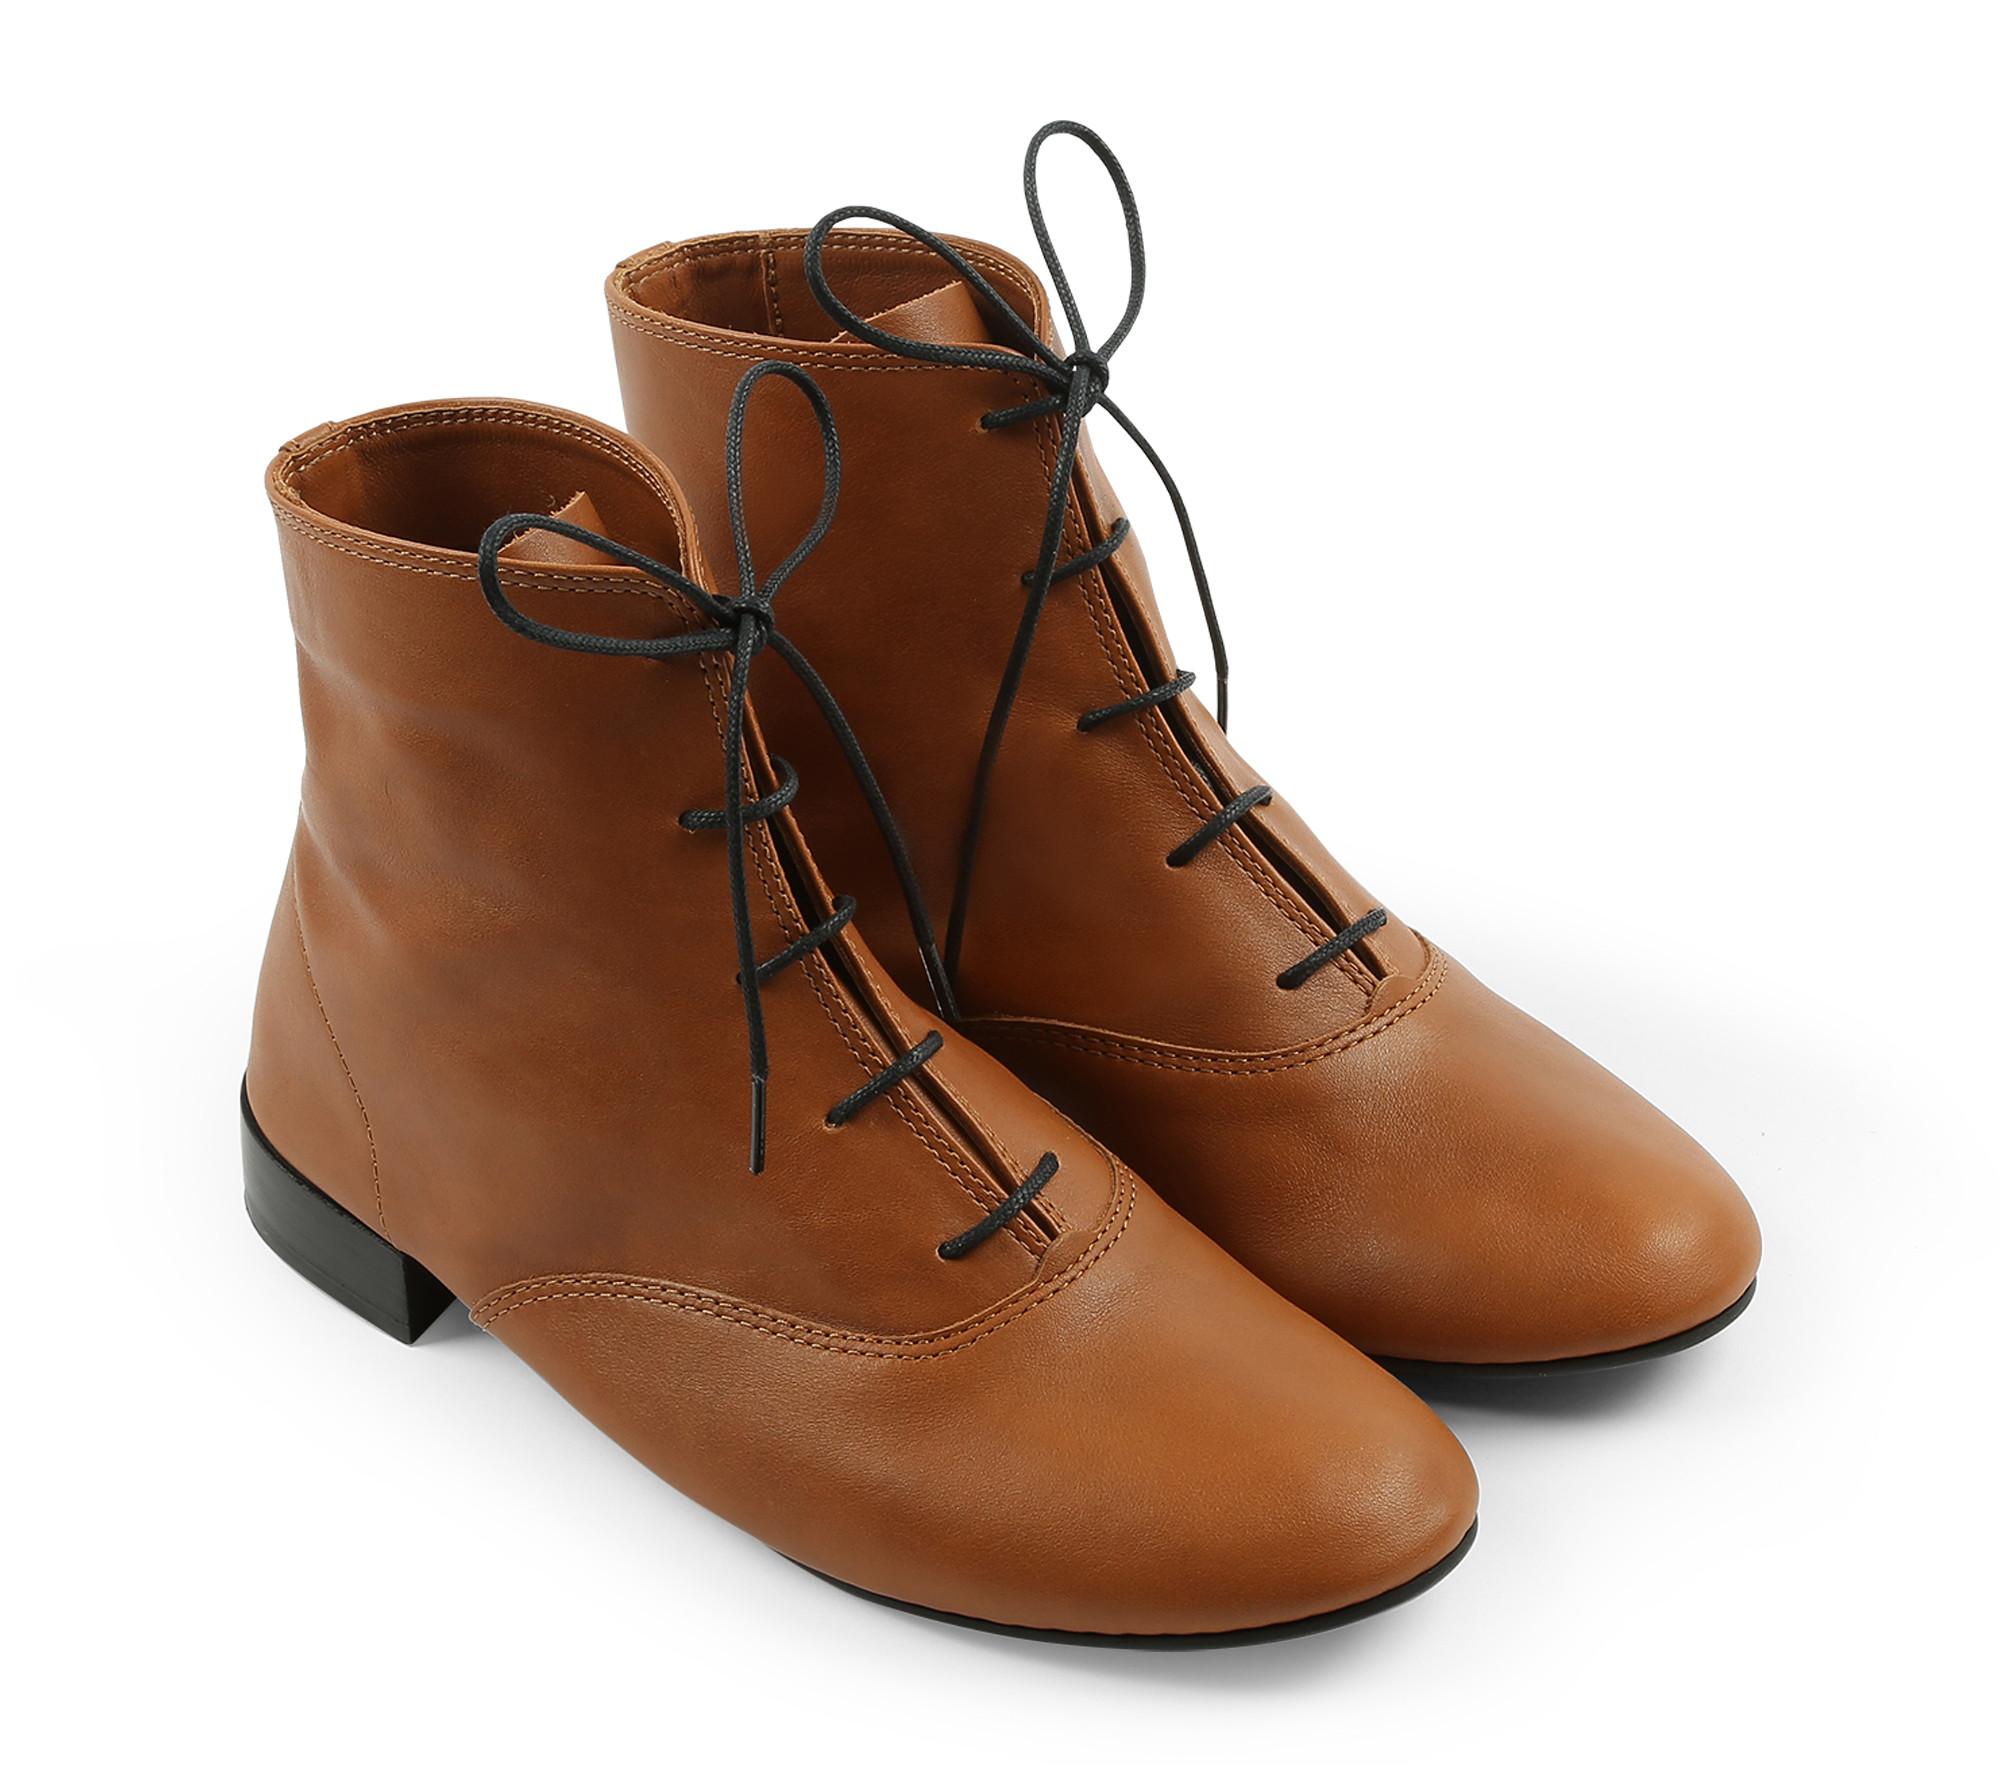 Joe oxford shoes